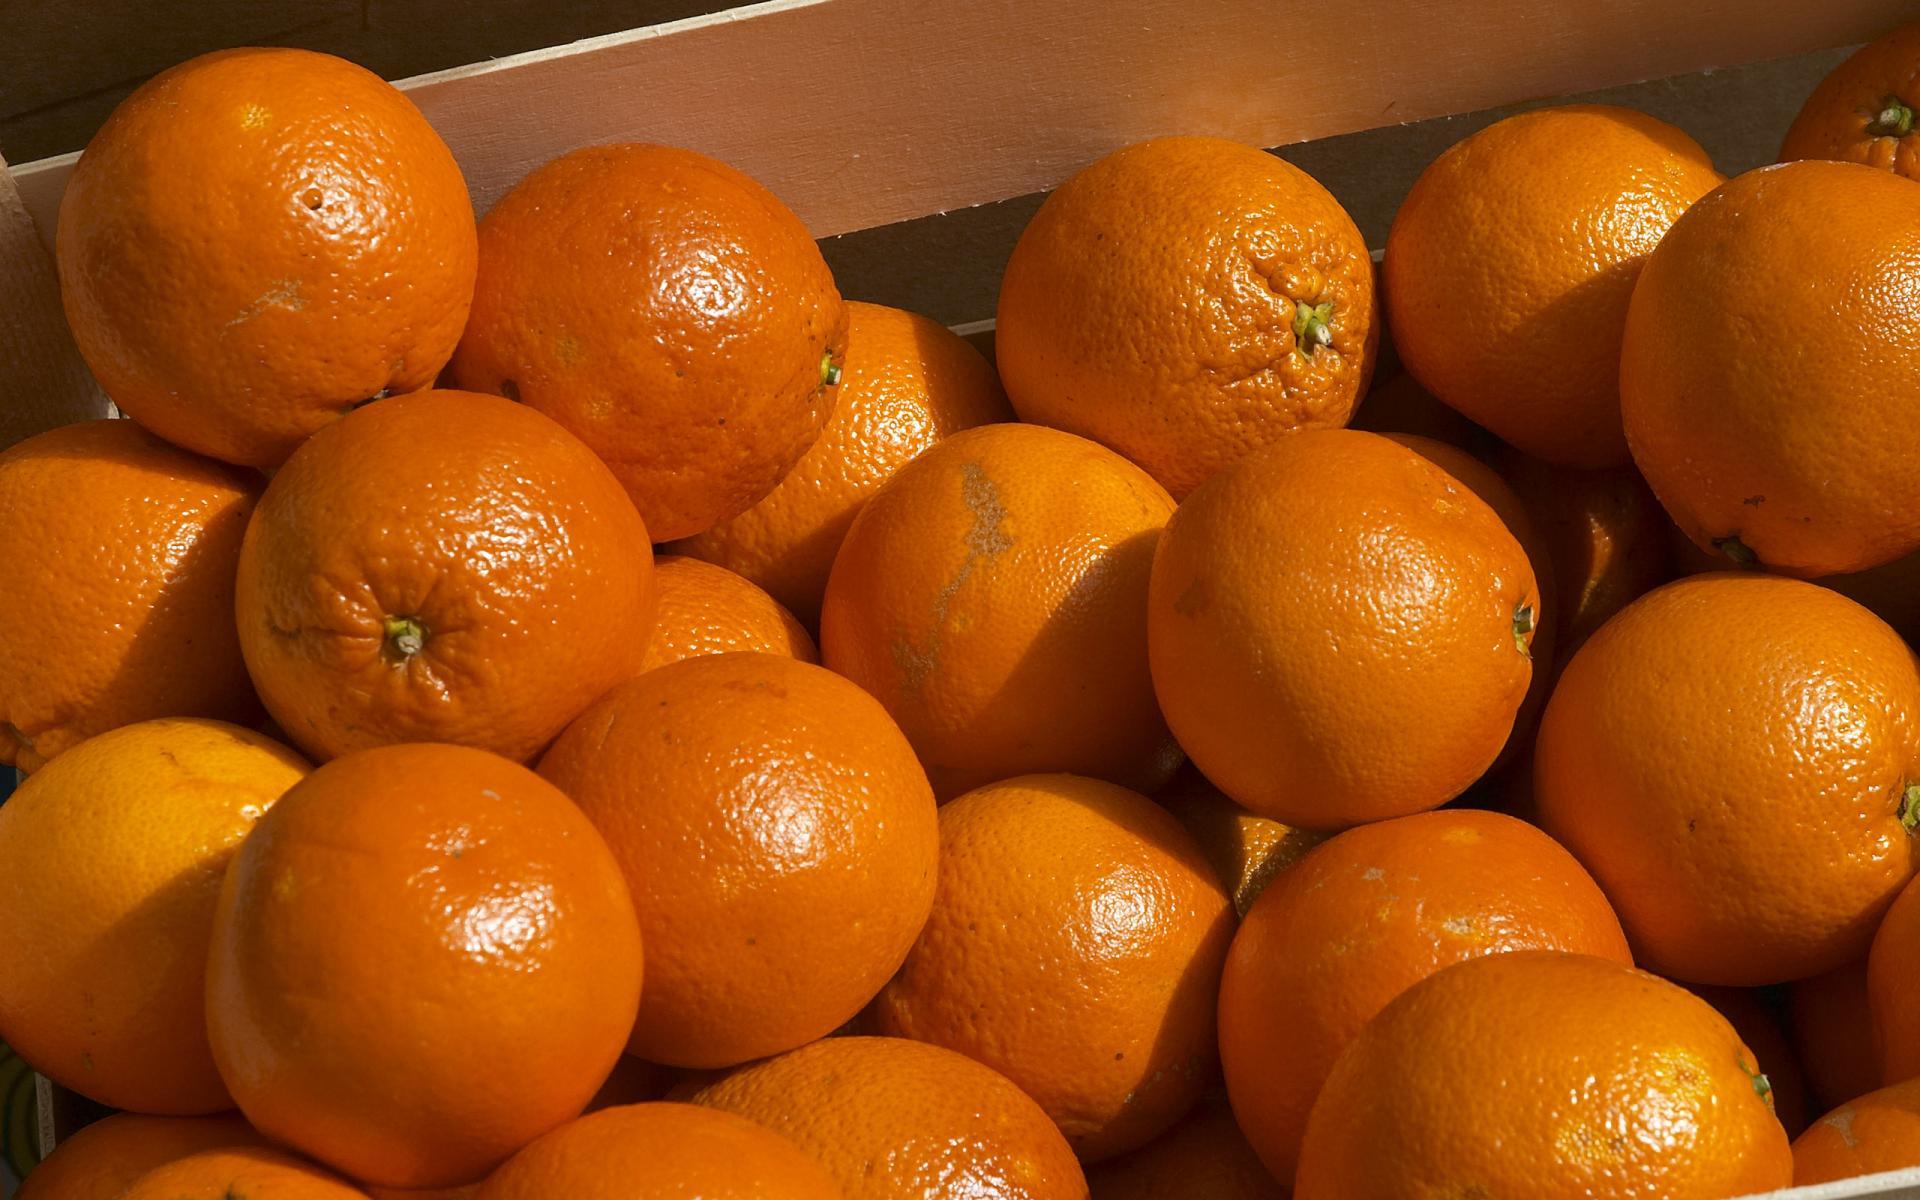 Orange Food wallpapers HD quality